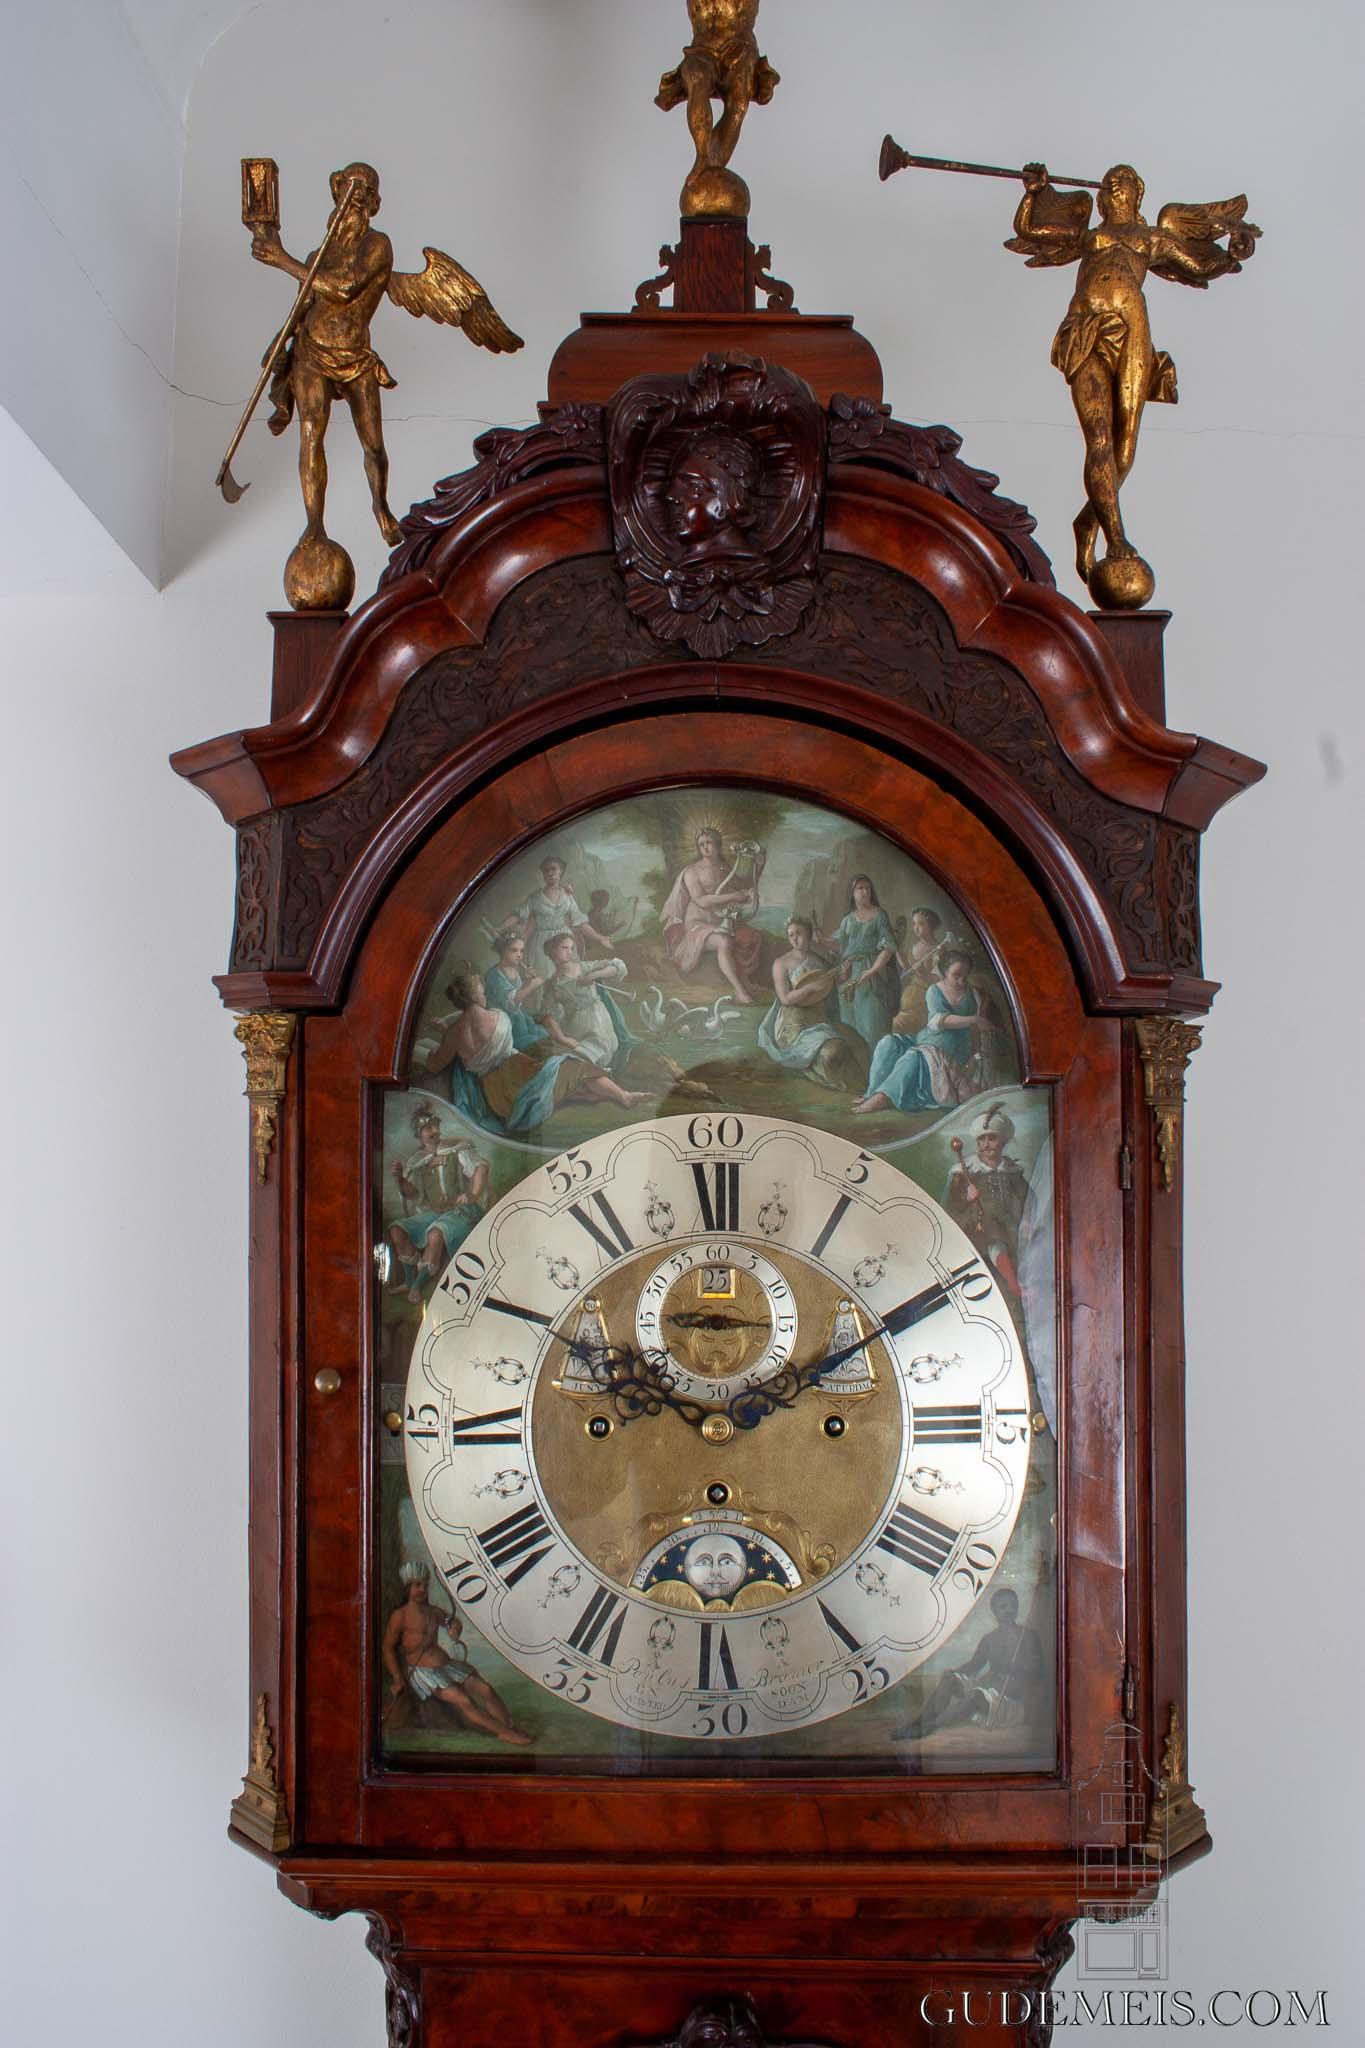 Dutch-Amsterdam-burr-walnut-Louis XV-painted-dial-musical-mechanism-Dutch-striking-full-calendar-moonphase-antique-longcase-clock